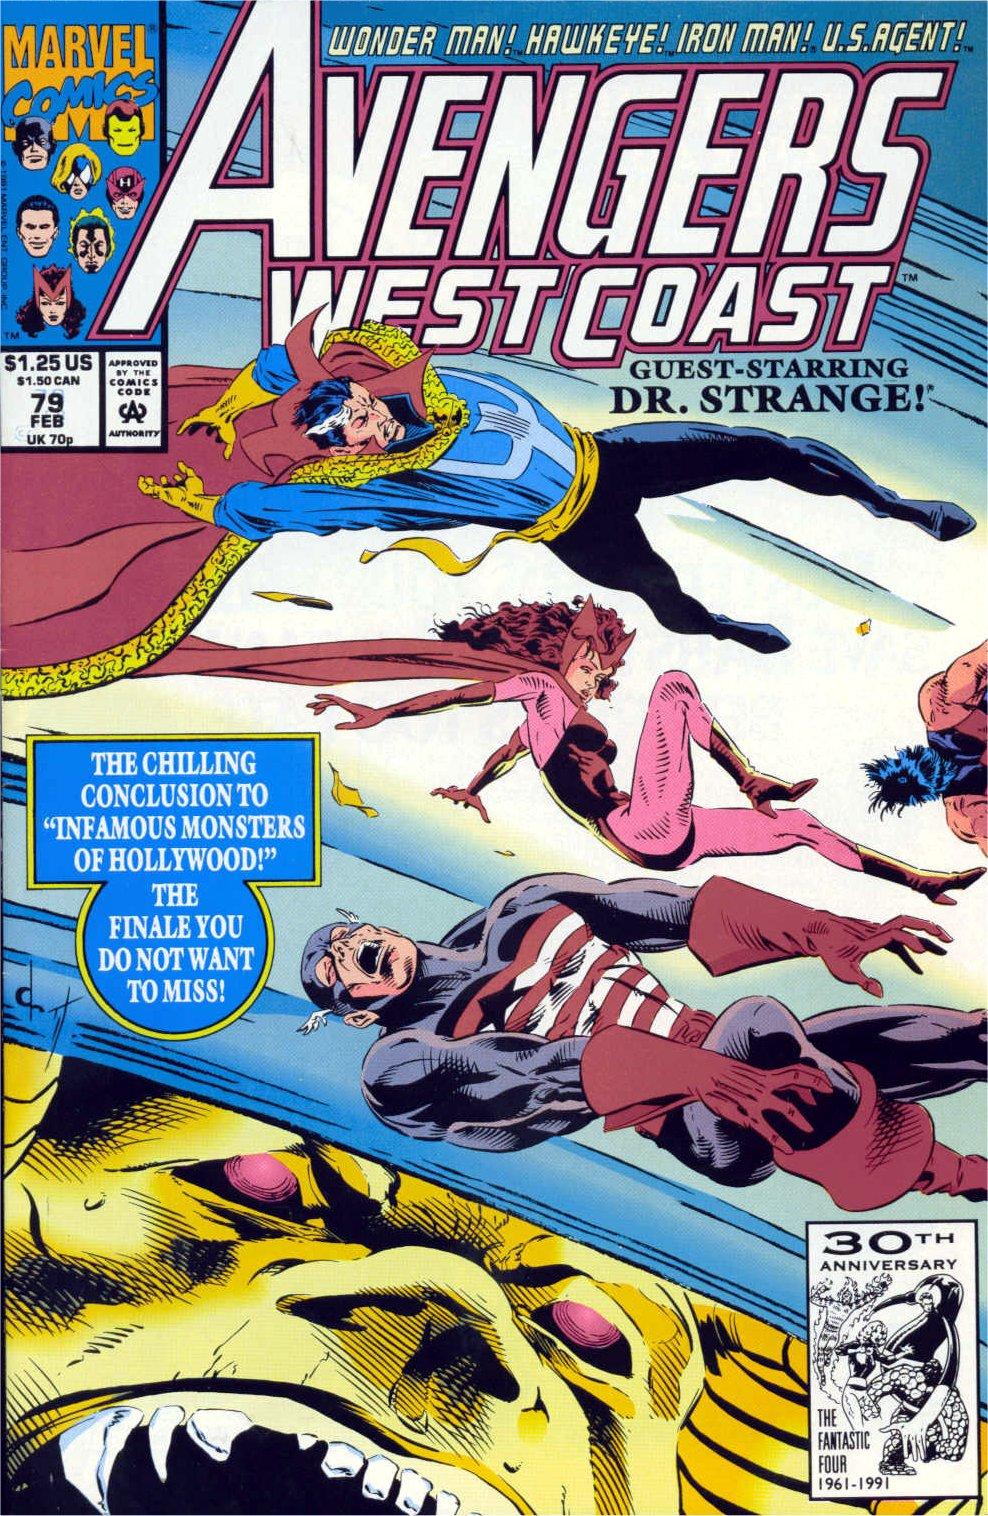 Avengers West Coast (1989) 79 Page 1